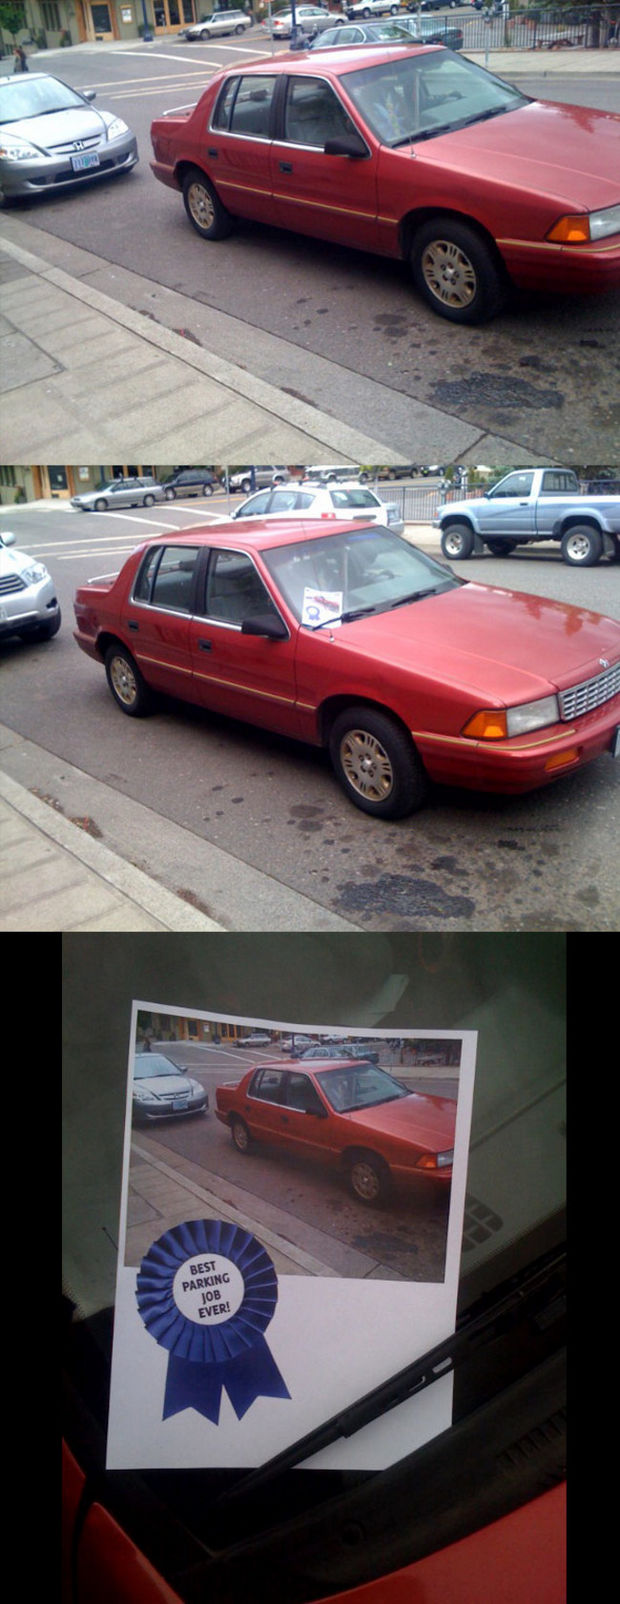 22 Bad Parking Jobs - Best parking job ever award.